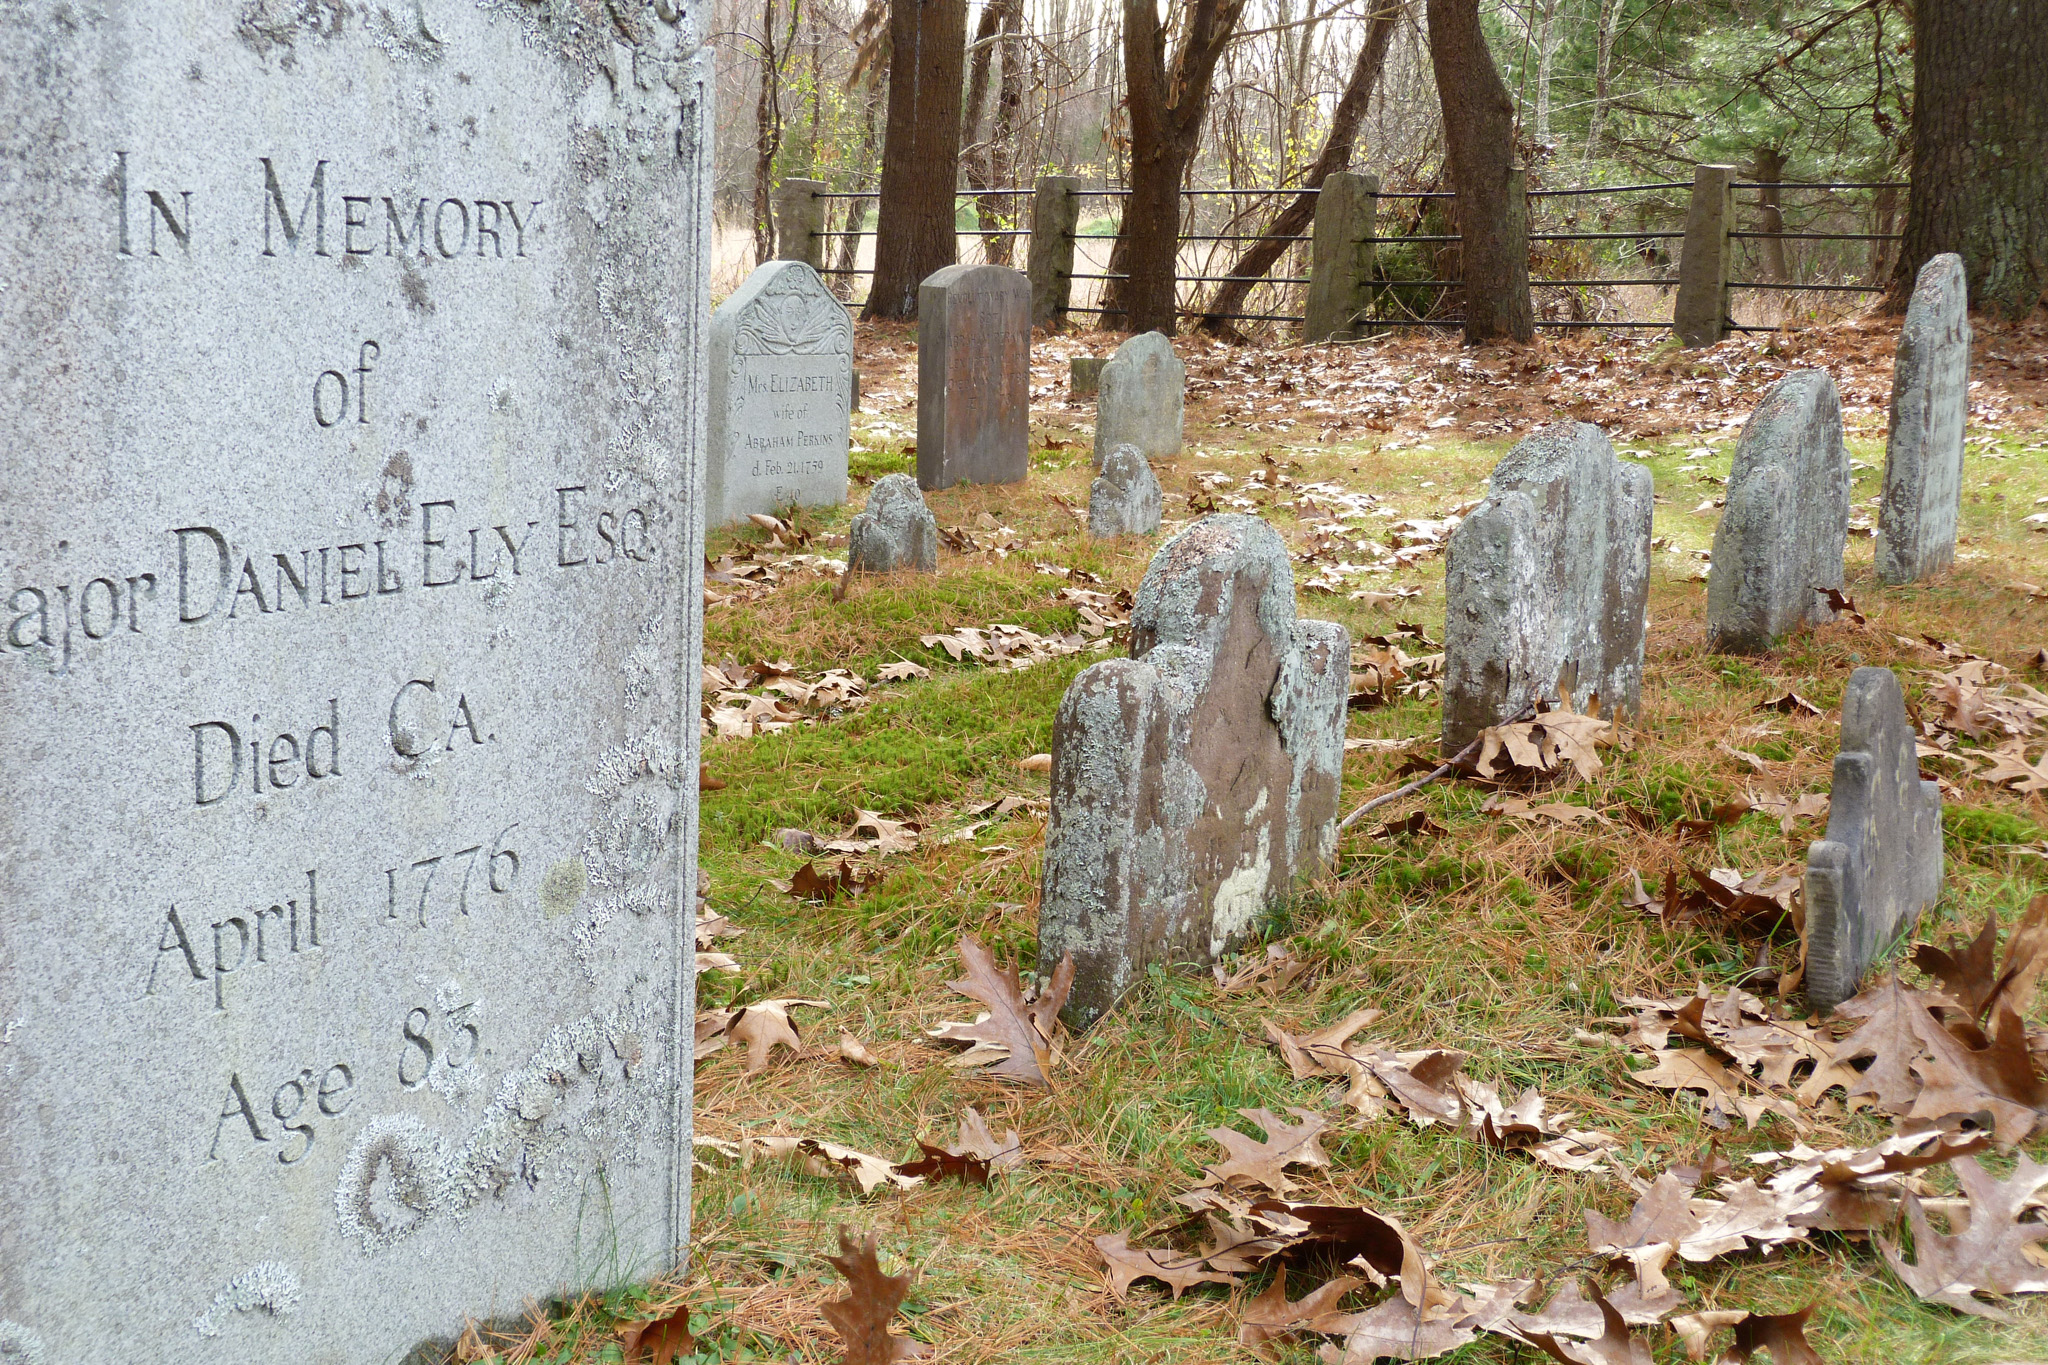 Daniel Ely Family Grave site